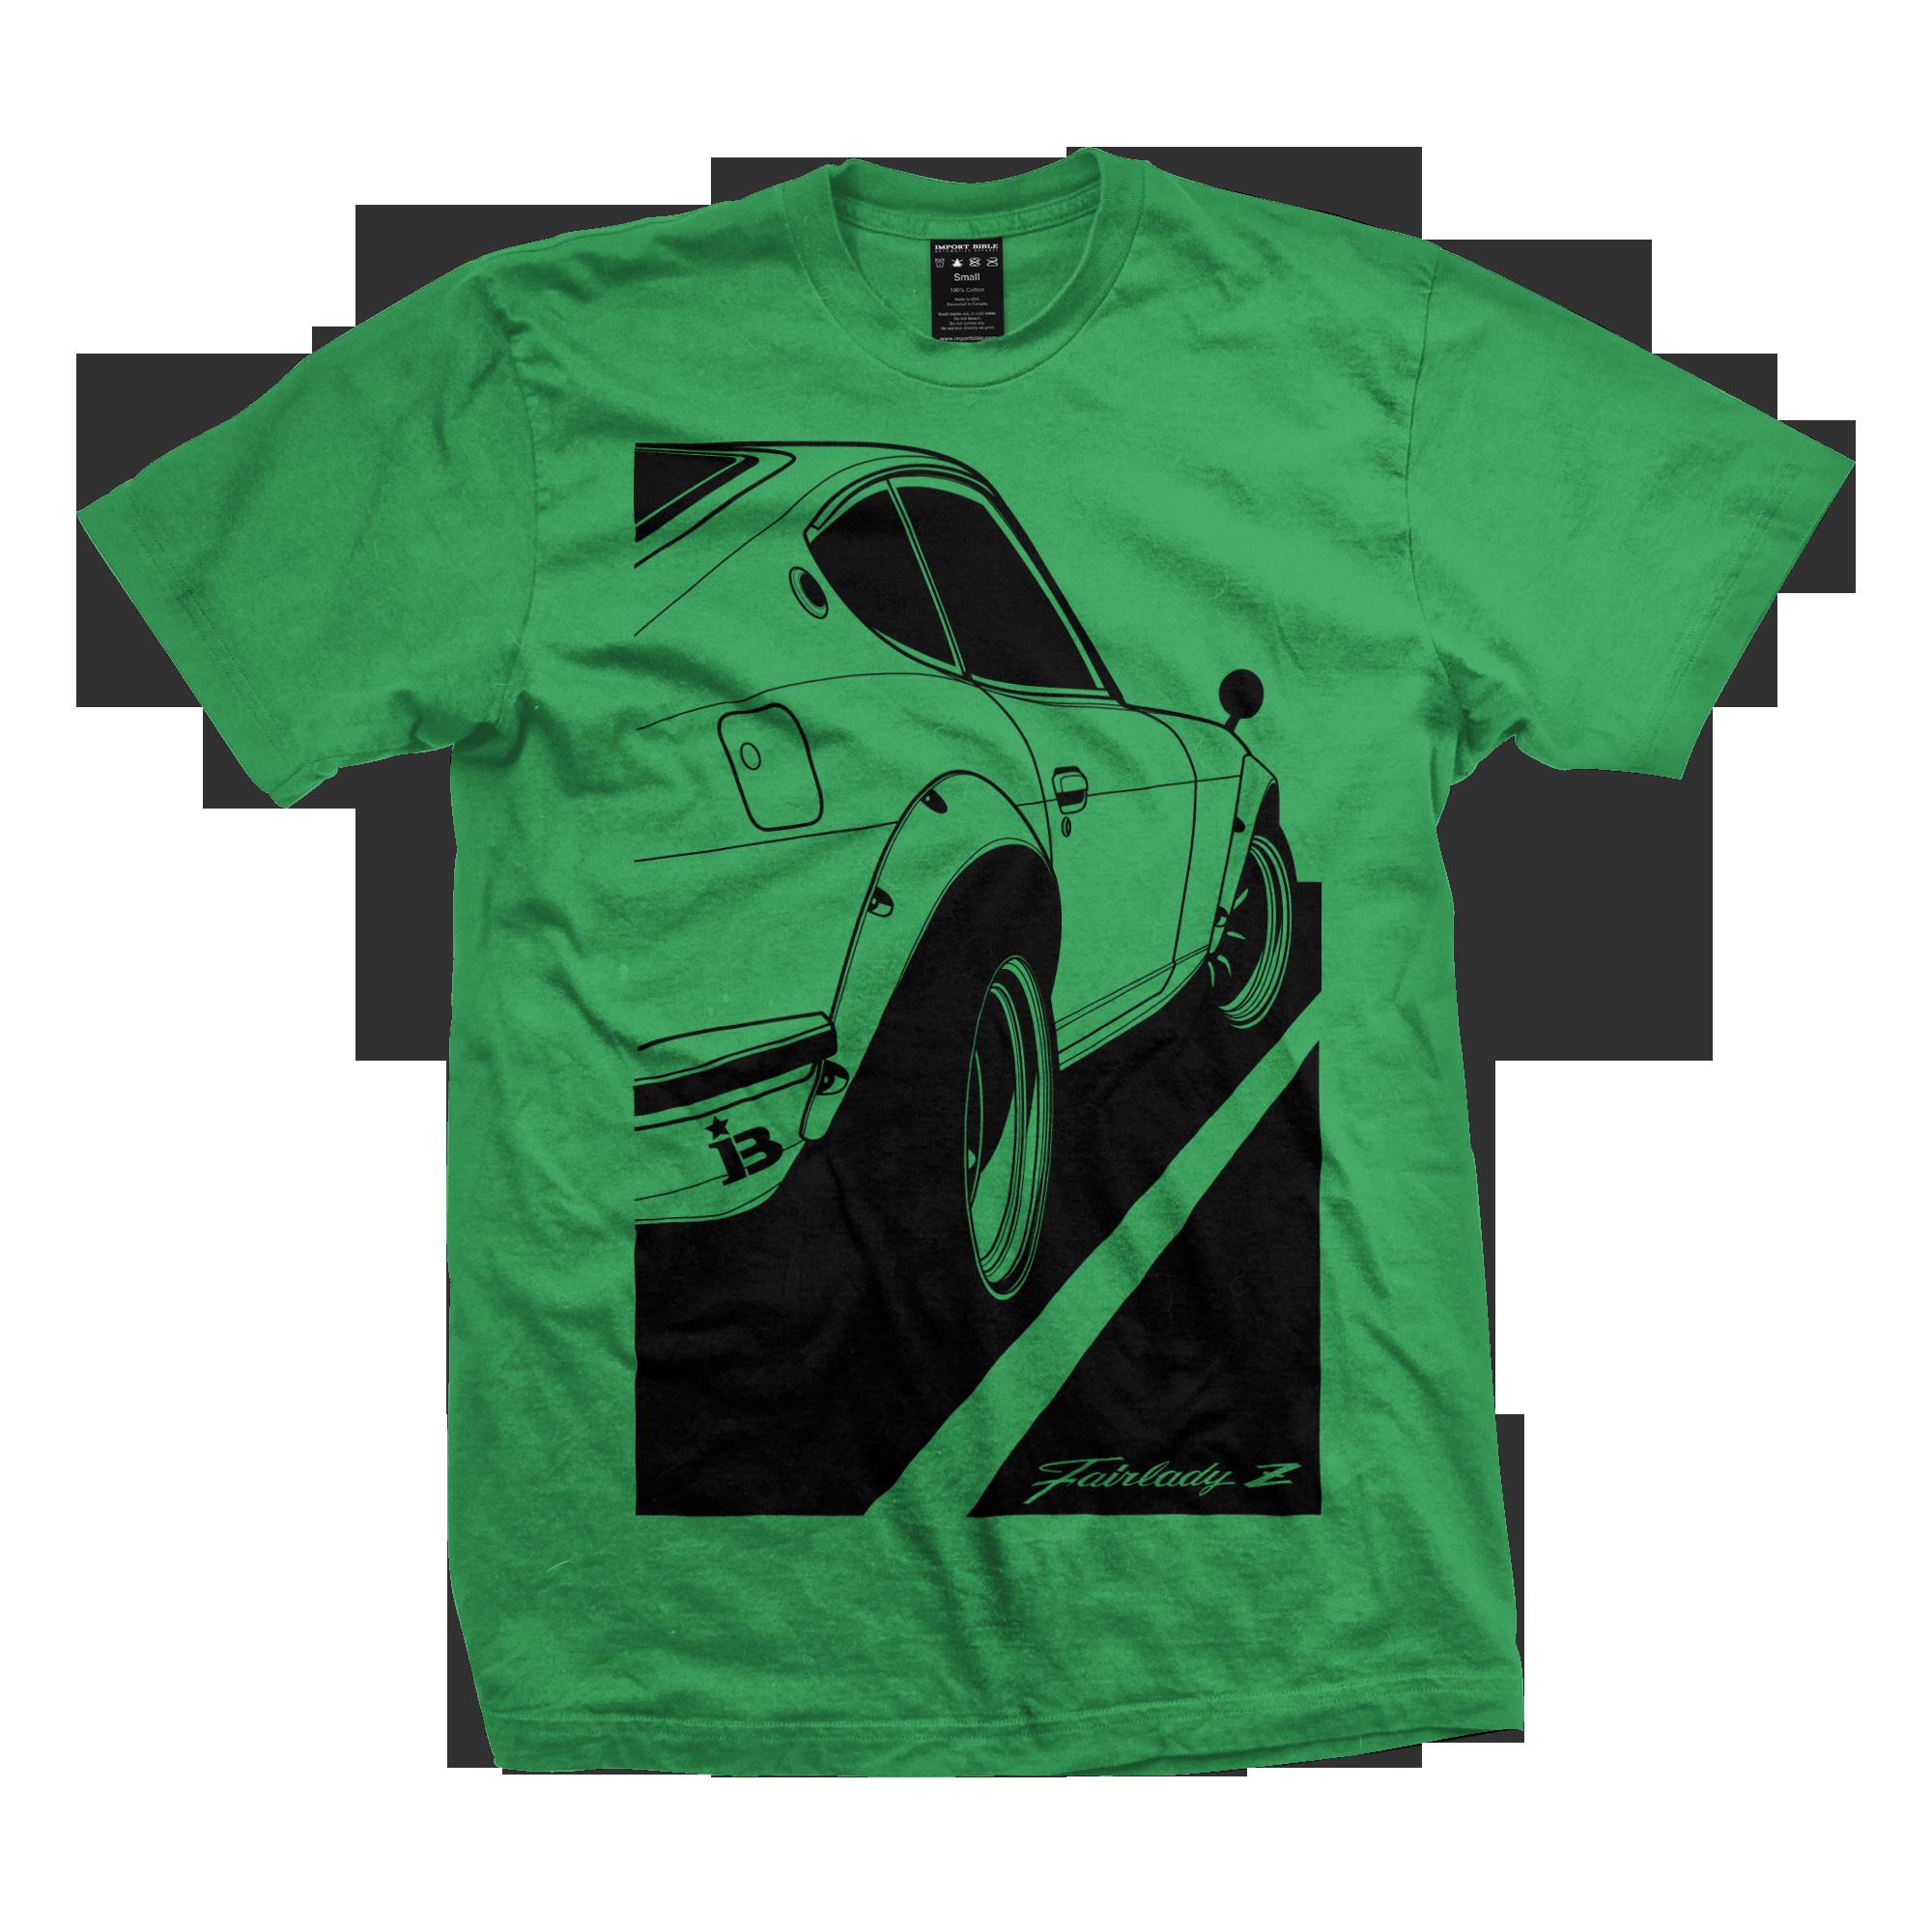 CONTEST: Fairlady Z T-Shirt from Import Bible | Japanese Nostalgic Car